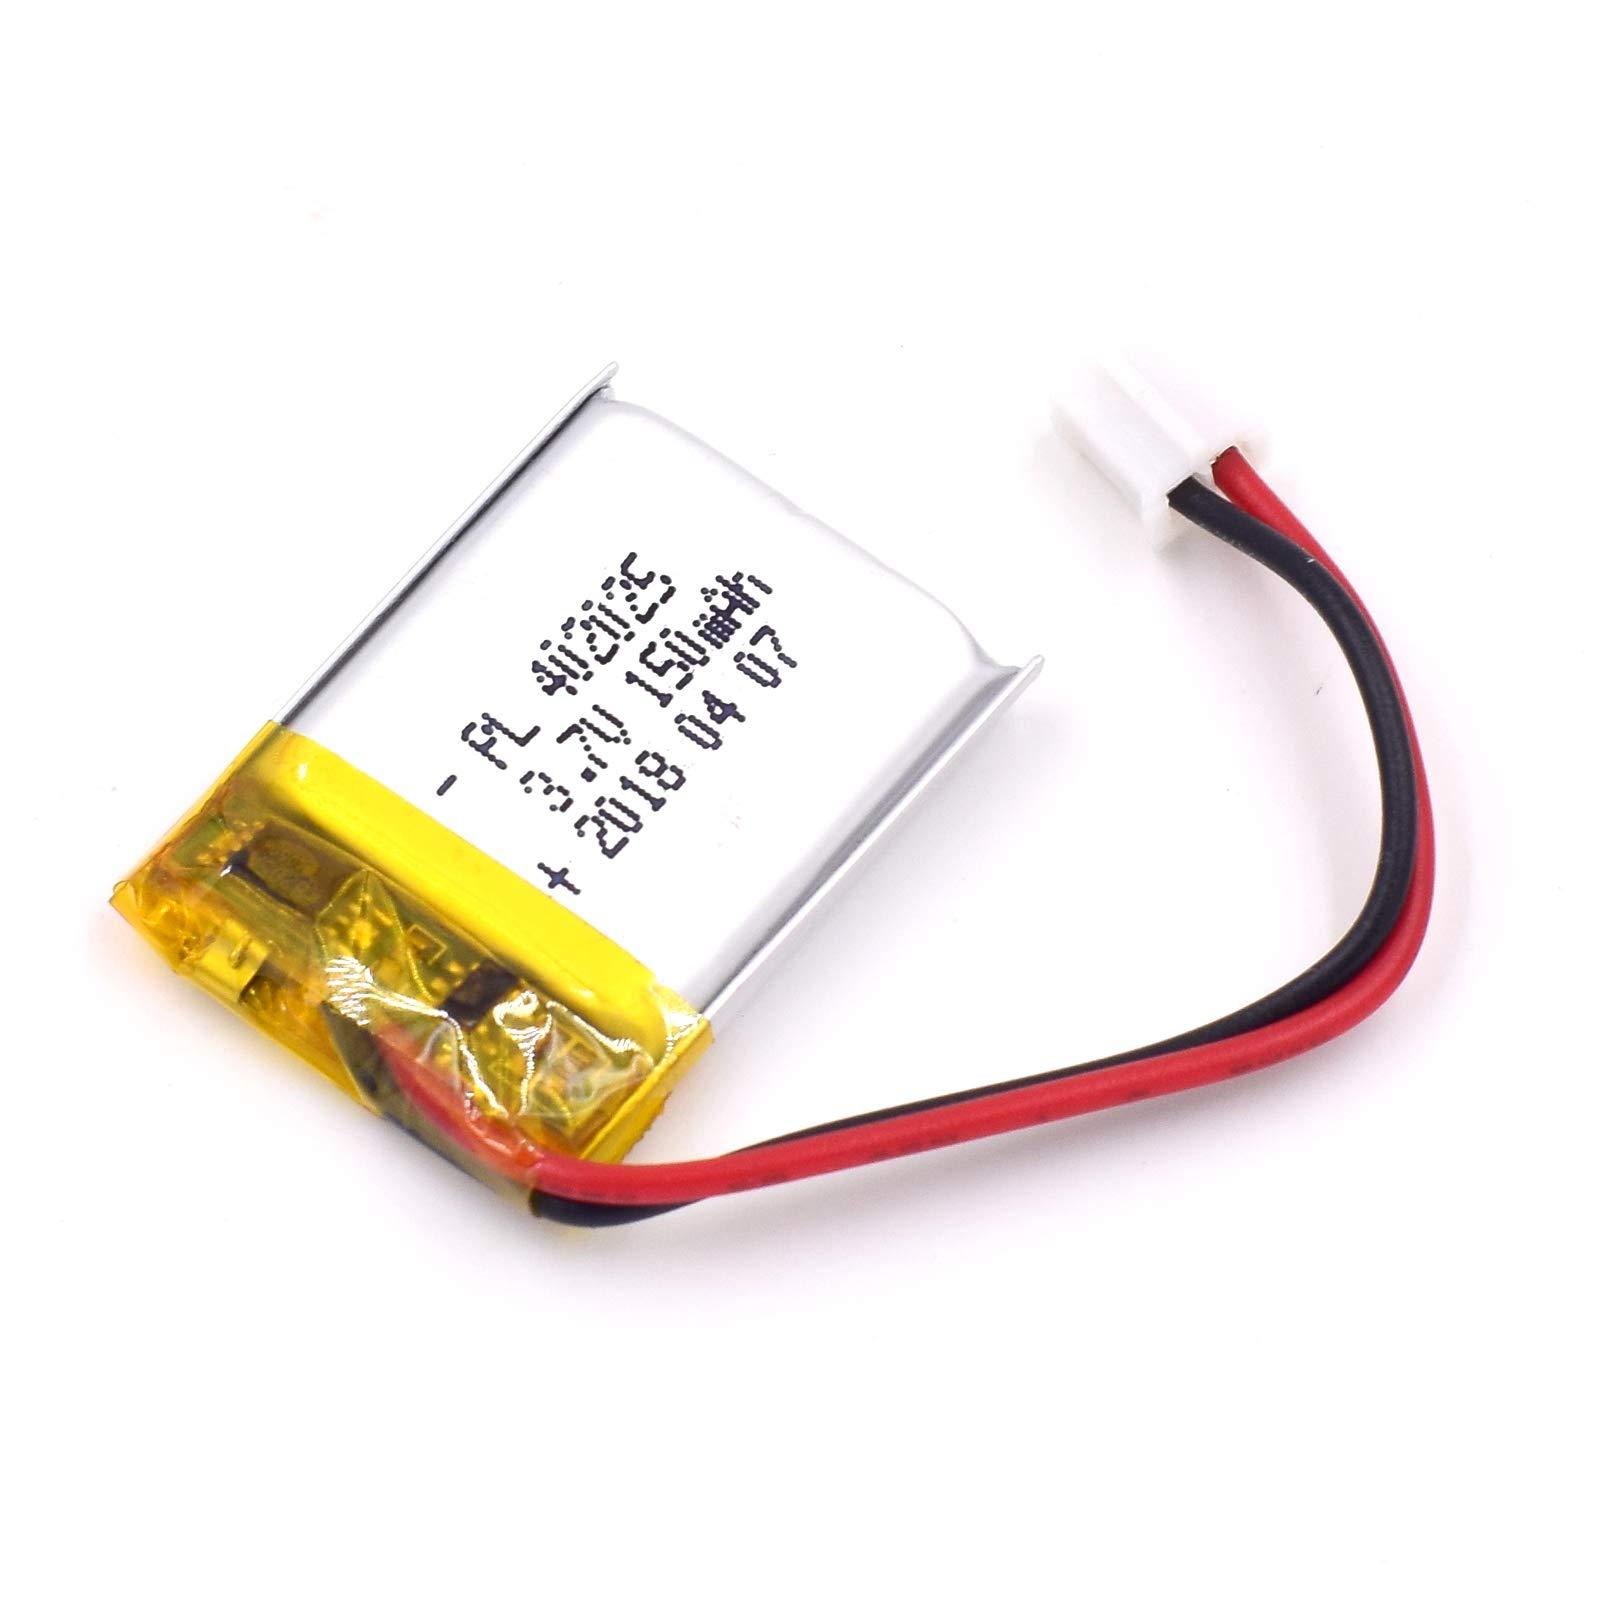 Bateria Lipo 3.7V 150mAh 402025 Recargable JST Conector